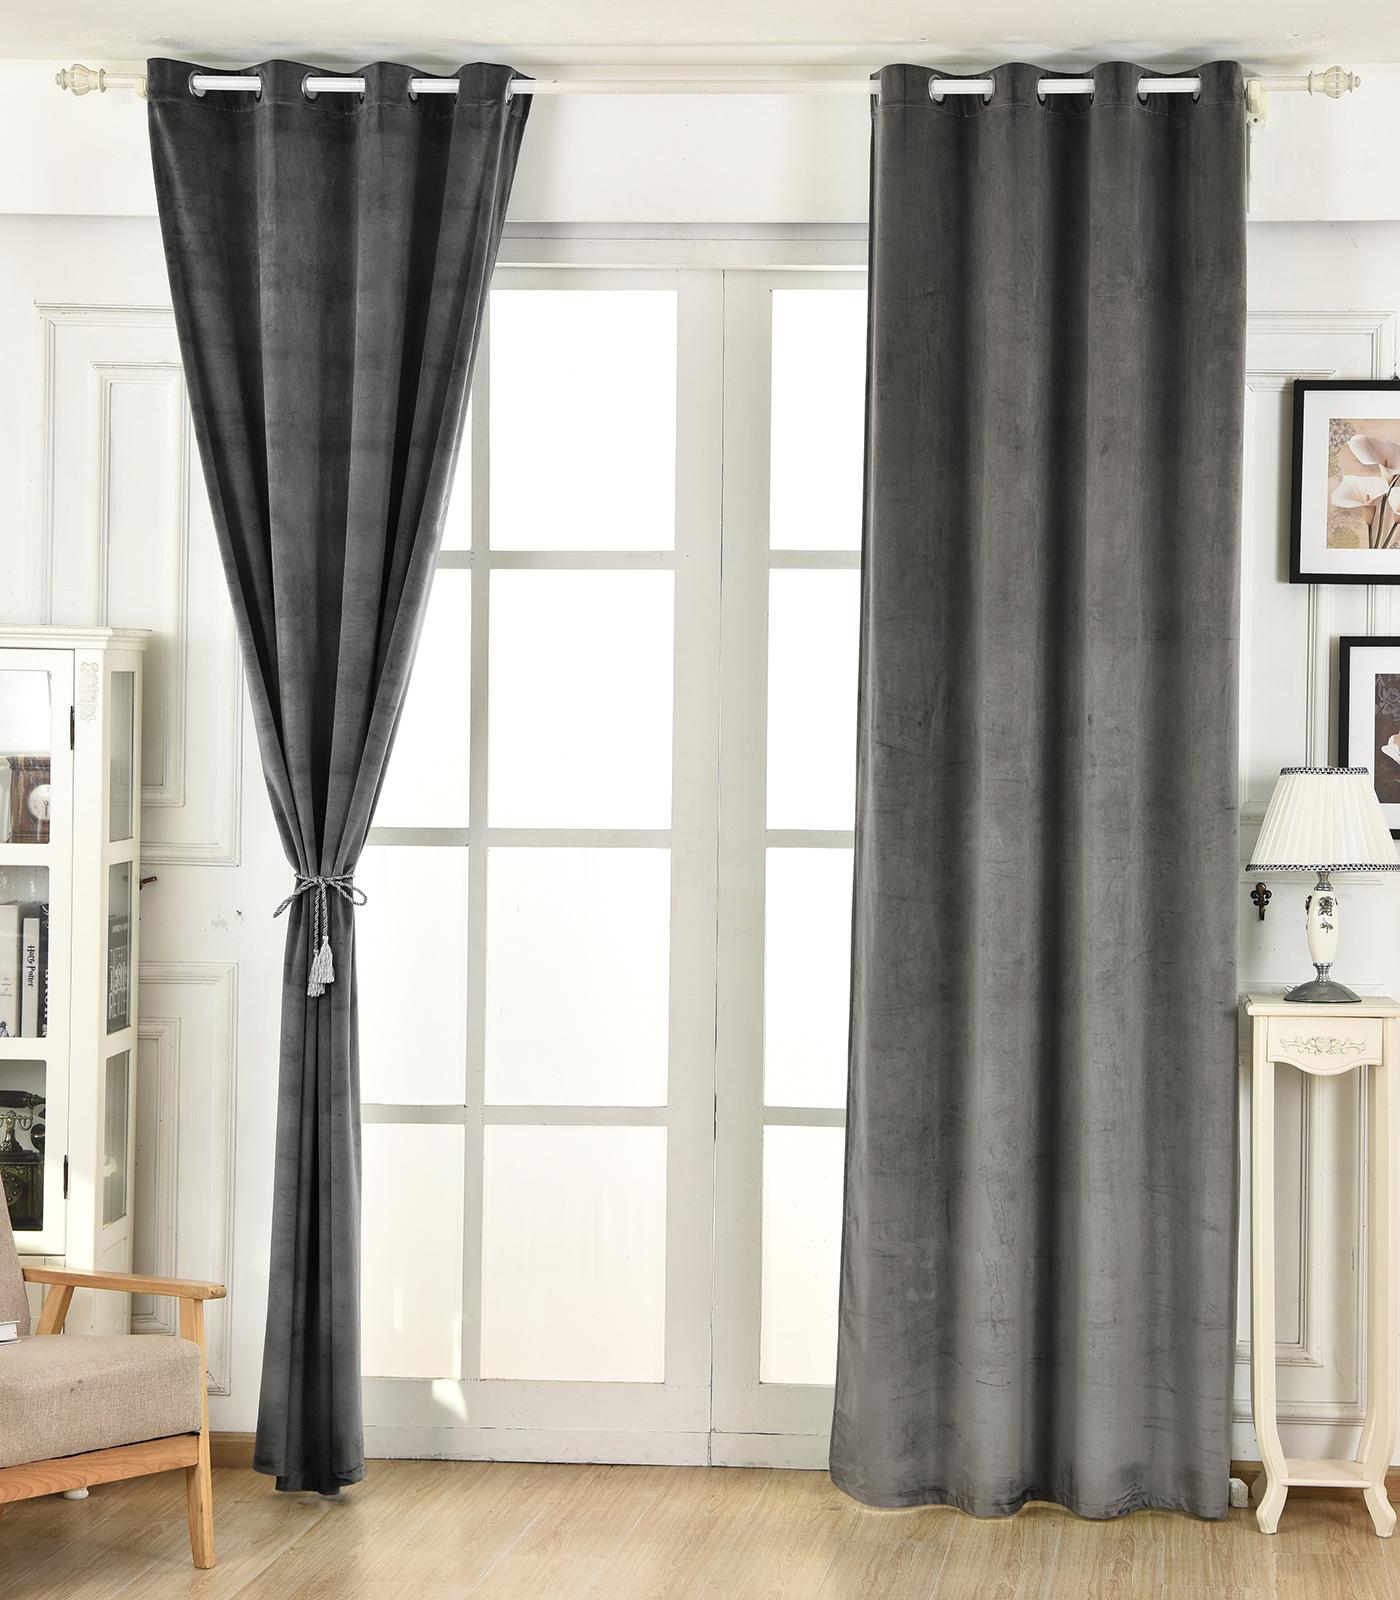 gardinen blickdicht thermogardine verdunklungsgardine sen beflockt vorhang 490. Black Bedroom Furniture Sets. Home Design Ideas